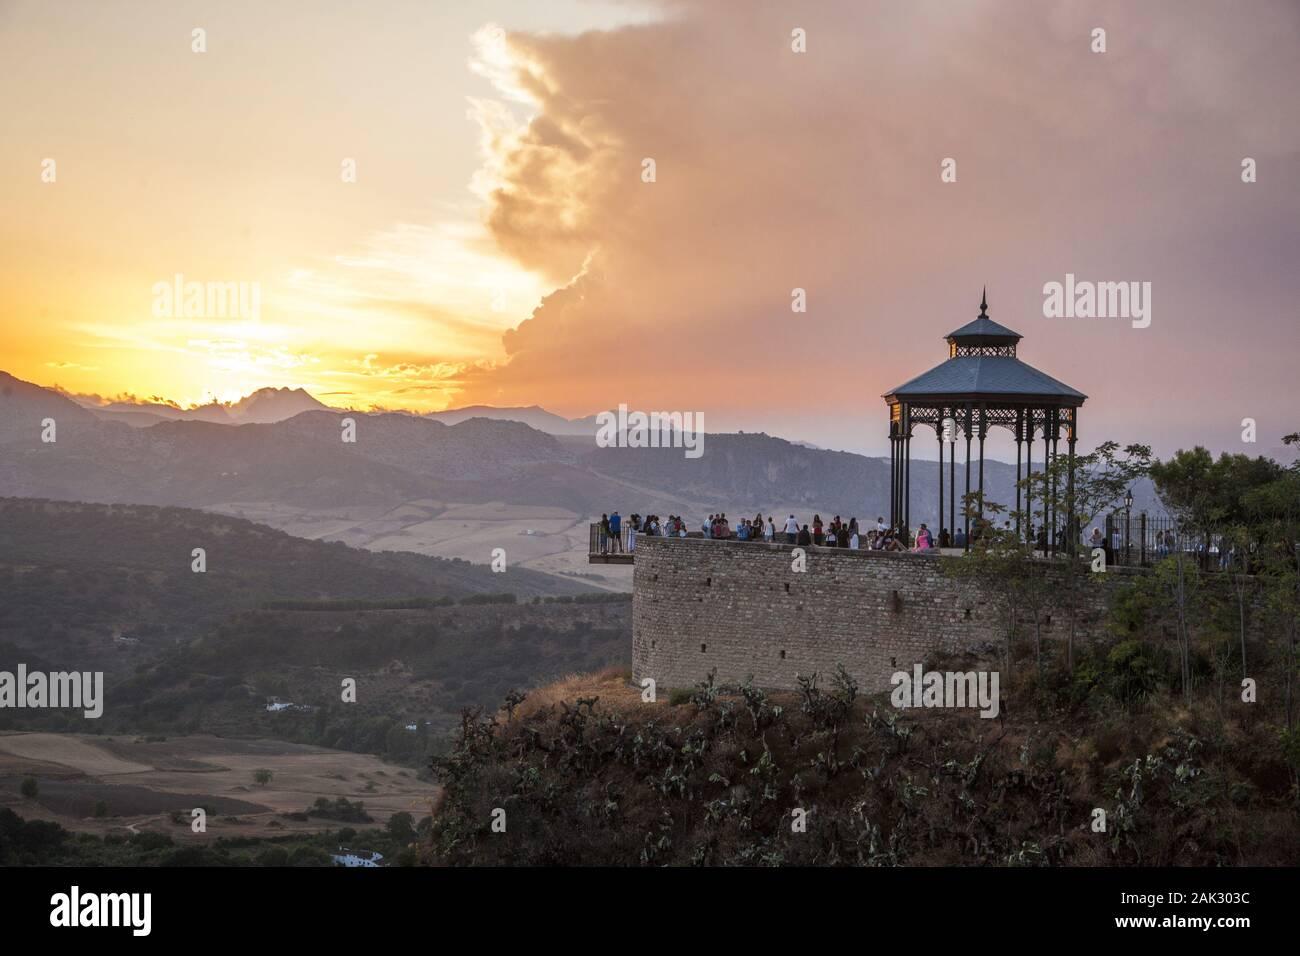 "Provinz Malaga/Ronda: ""Mirador de Ronda"", Aussichtspunkt am Rande eines Felsens, Andalusien | usage worldwide Stock Photo"